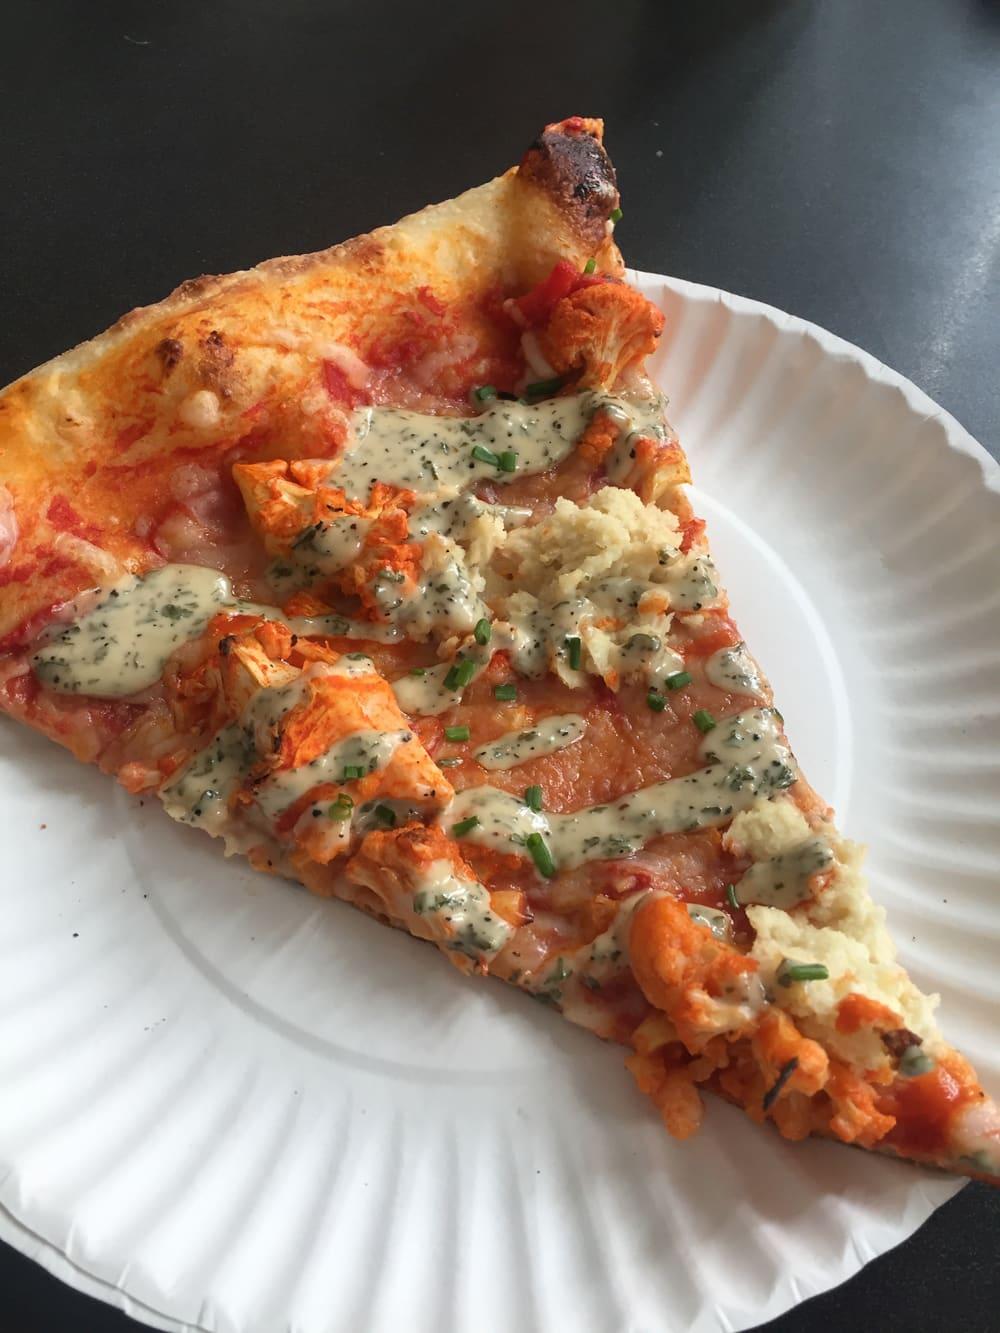 Best Vegetarian Restaurants New York